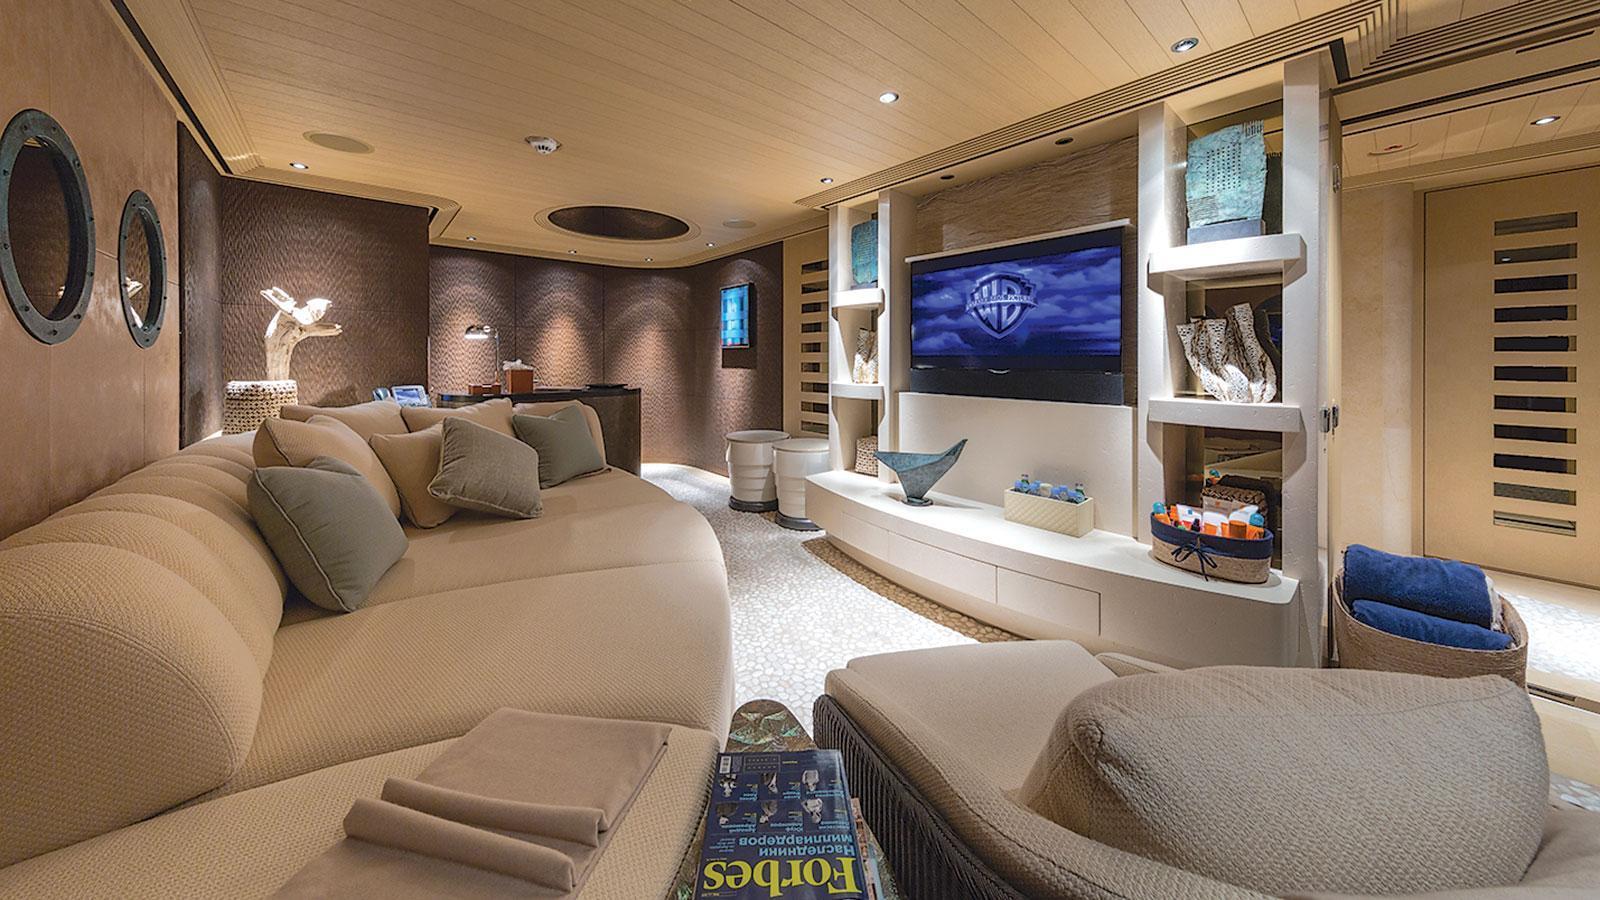 romea-motor-yacht-abeking-rasmussen-2015-82m-media-room